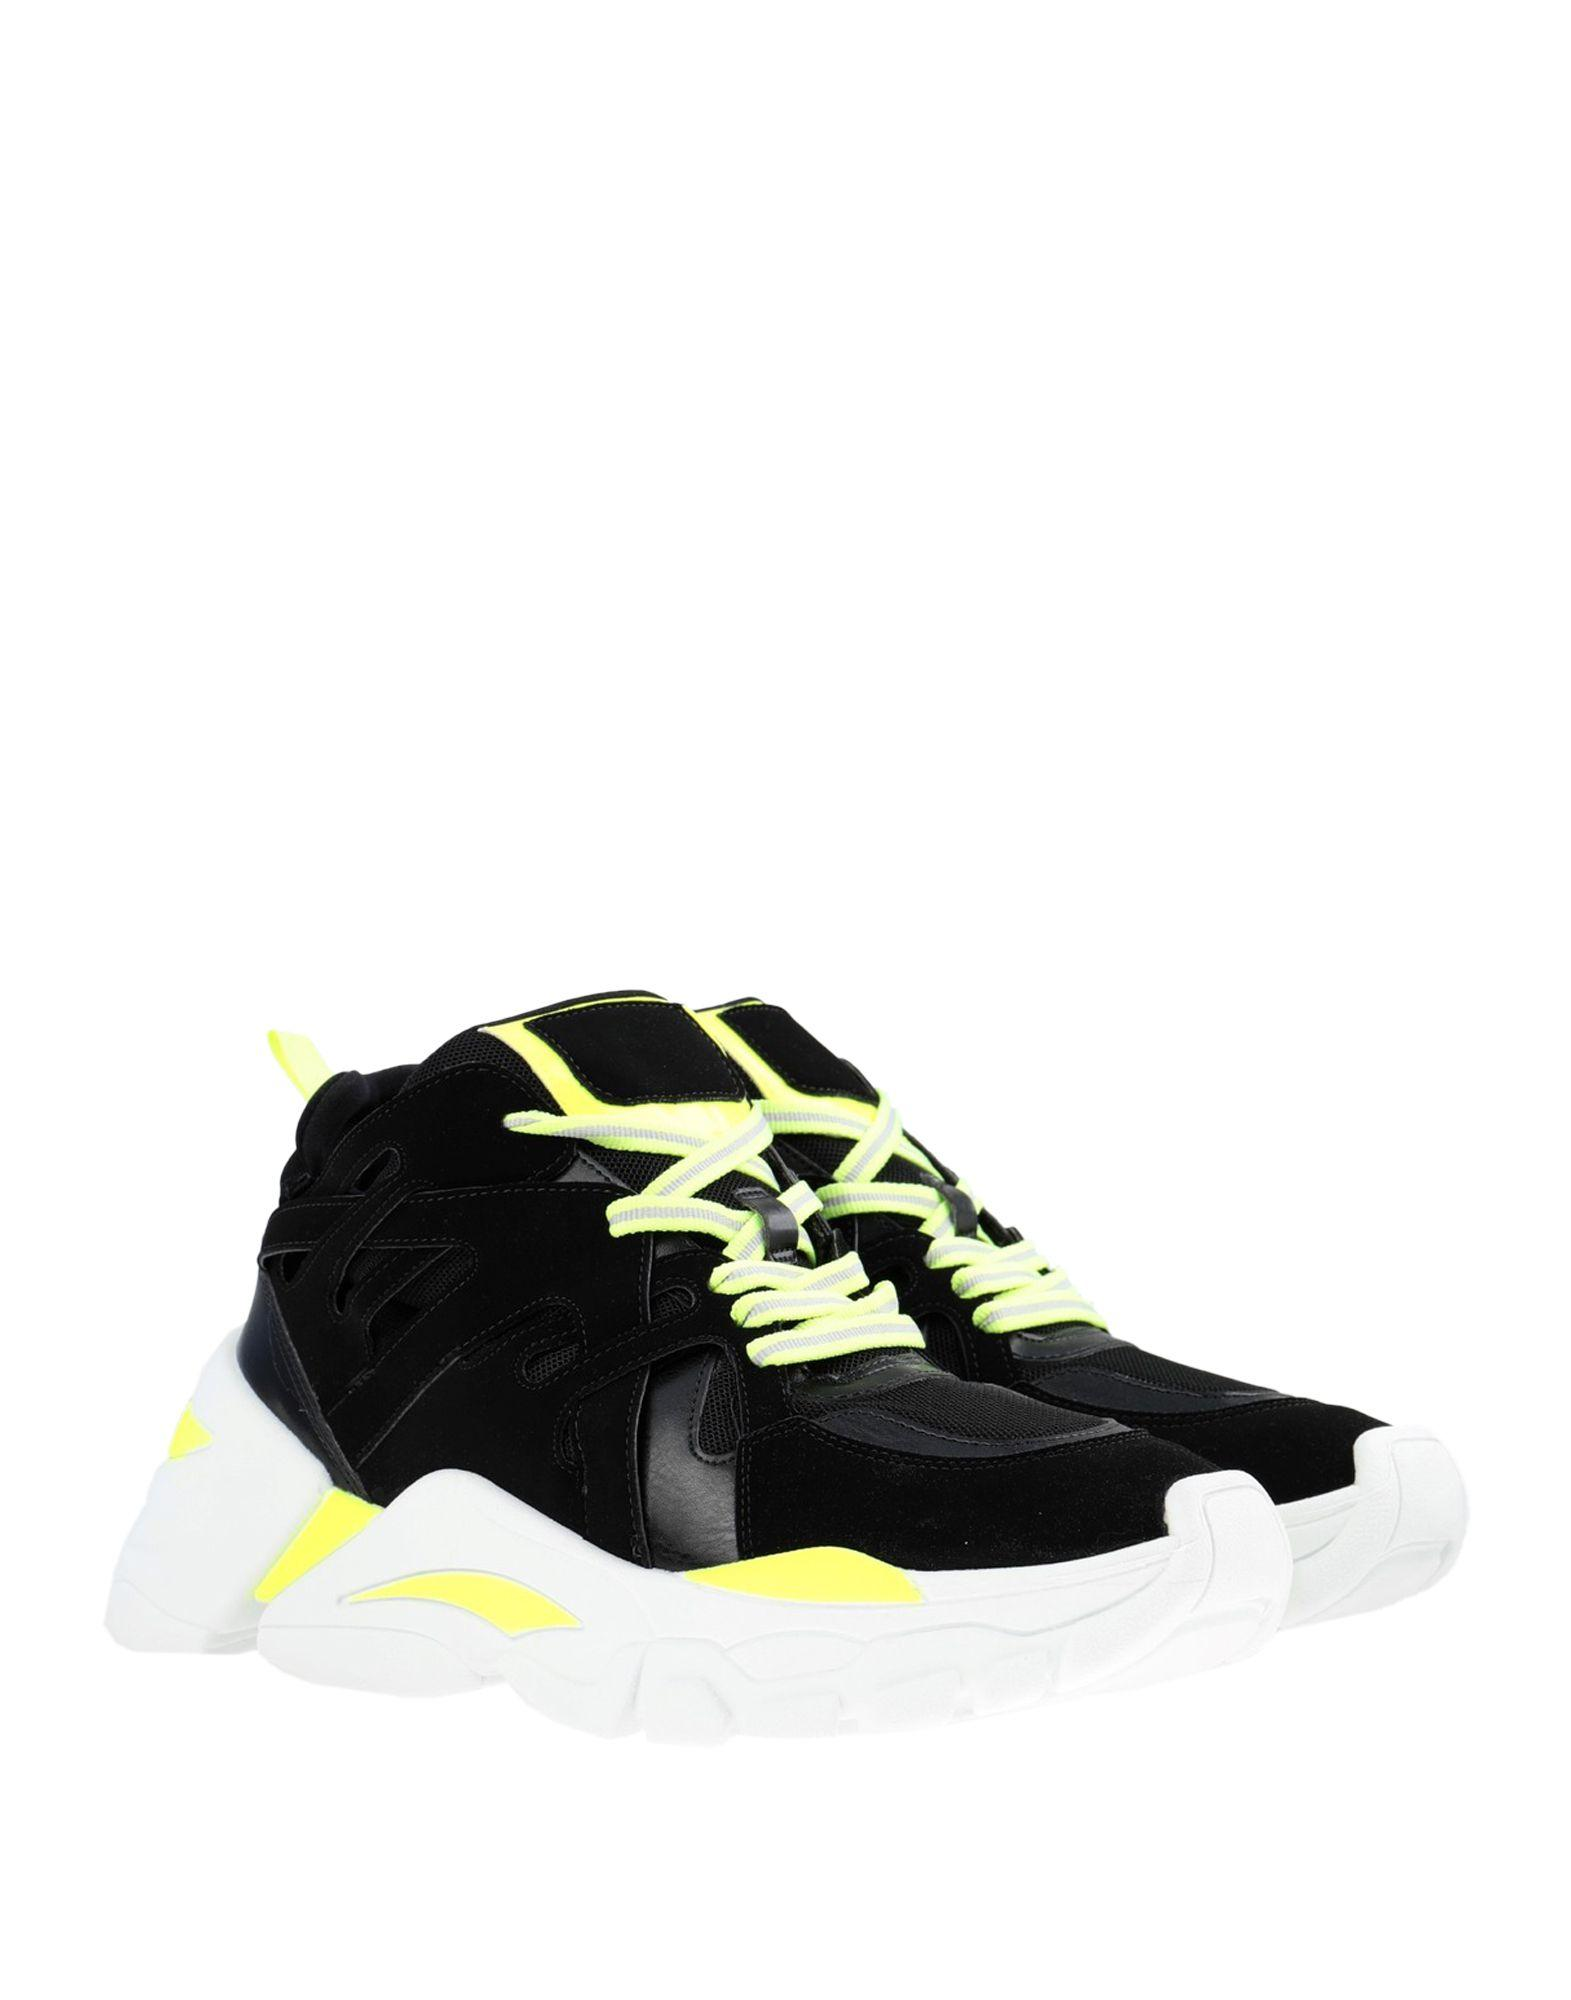 Sneakers & Deportivas Steve Madden de Tejido sintético de color Negro